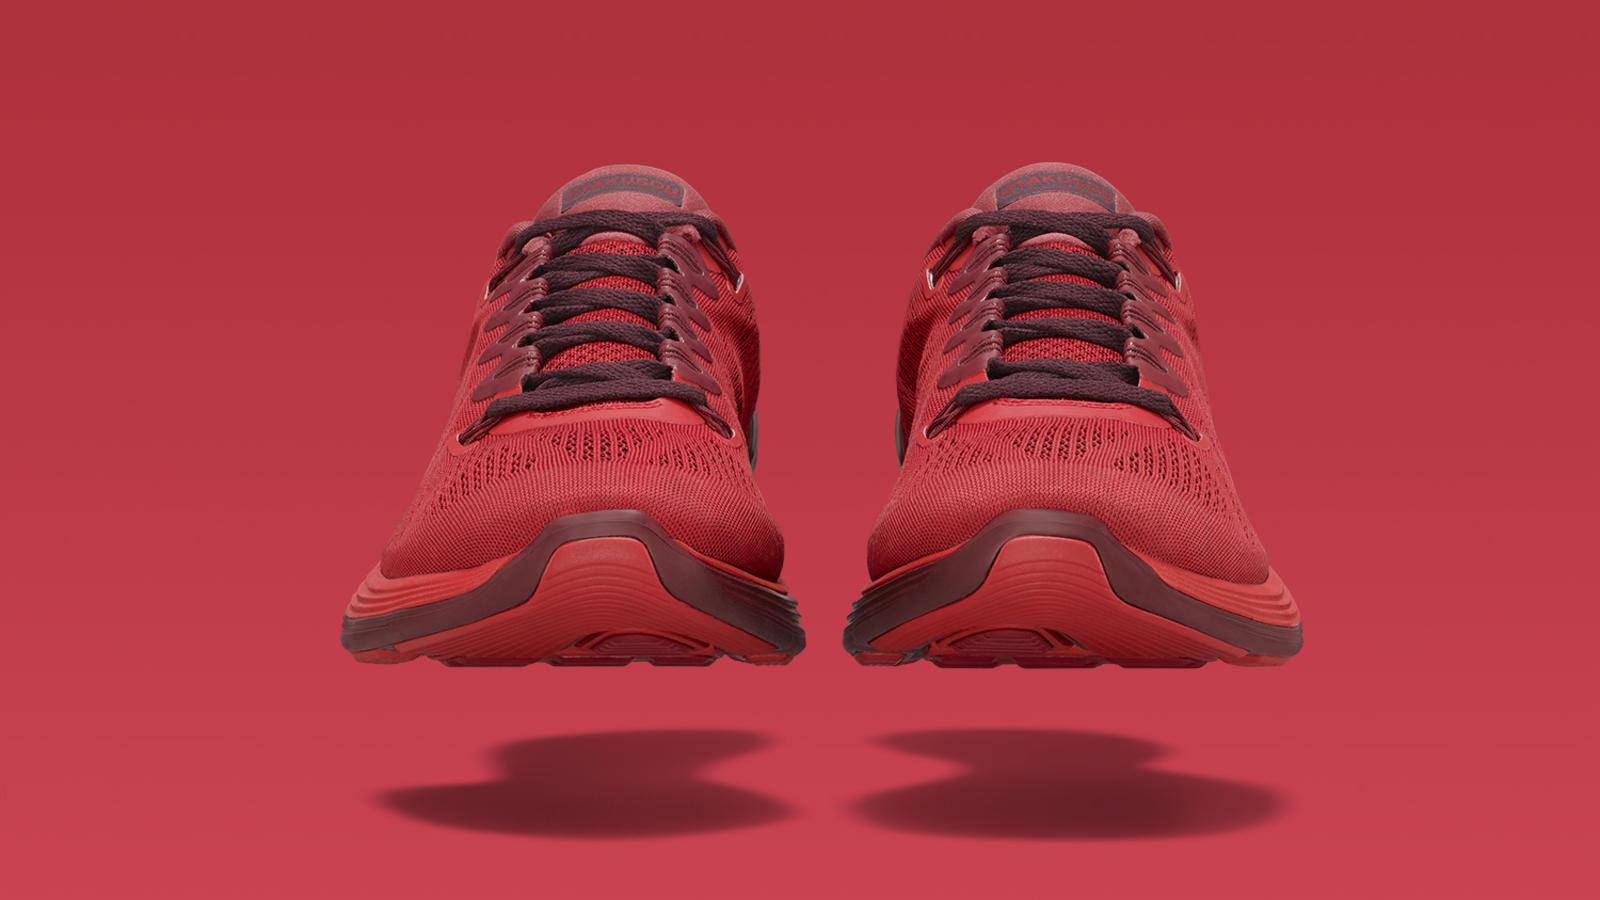 Nike x Undercover Gyakusou Holiday 2013 Collection photo